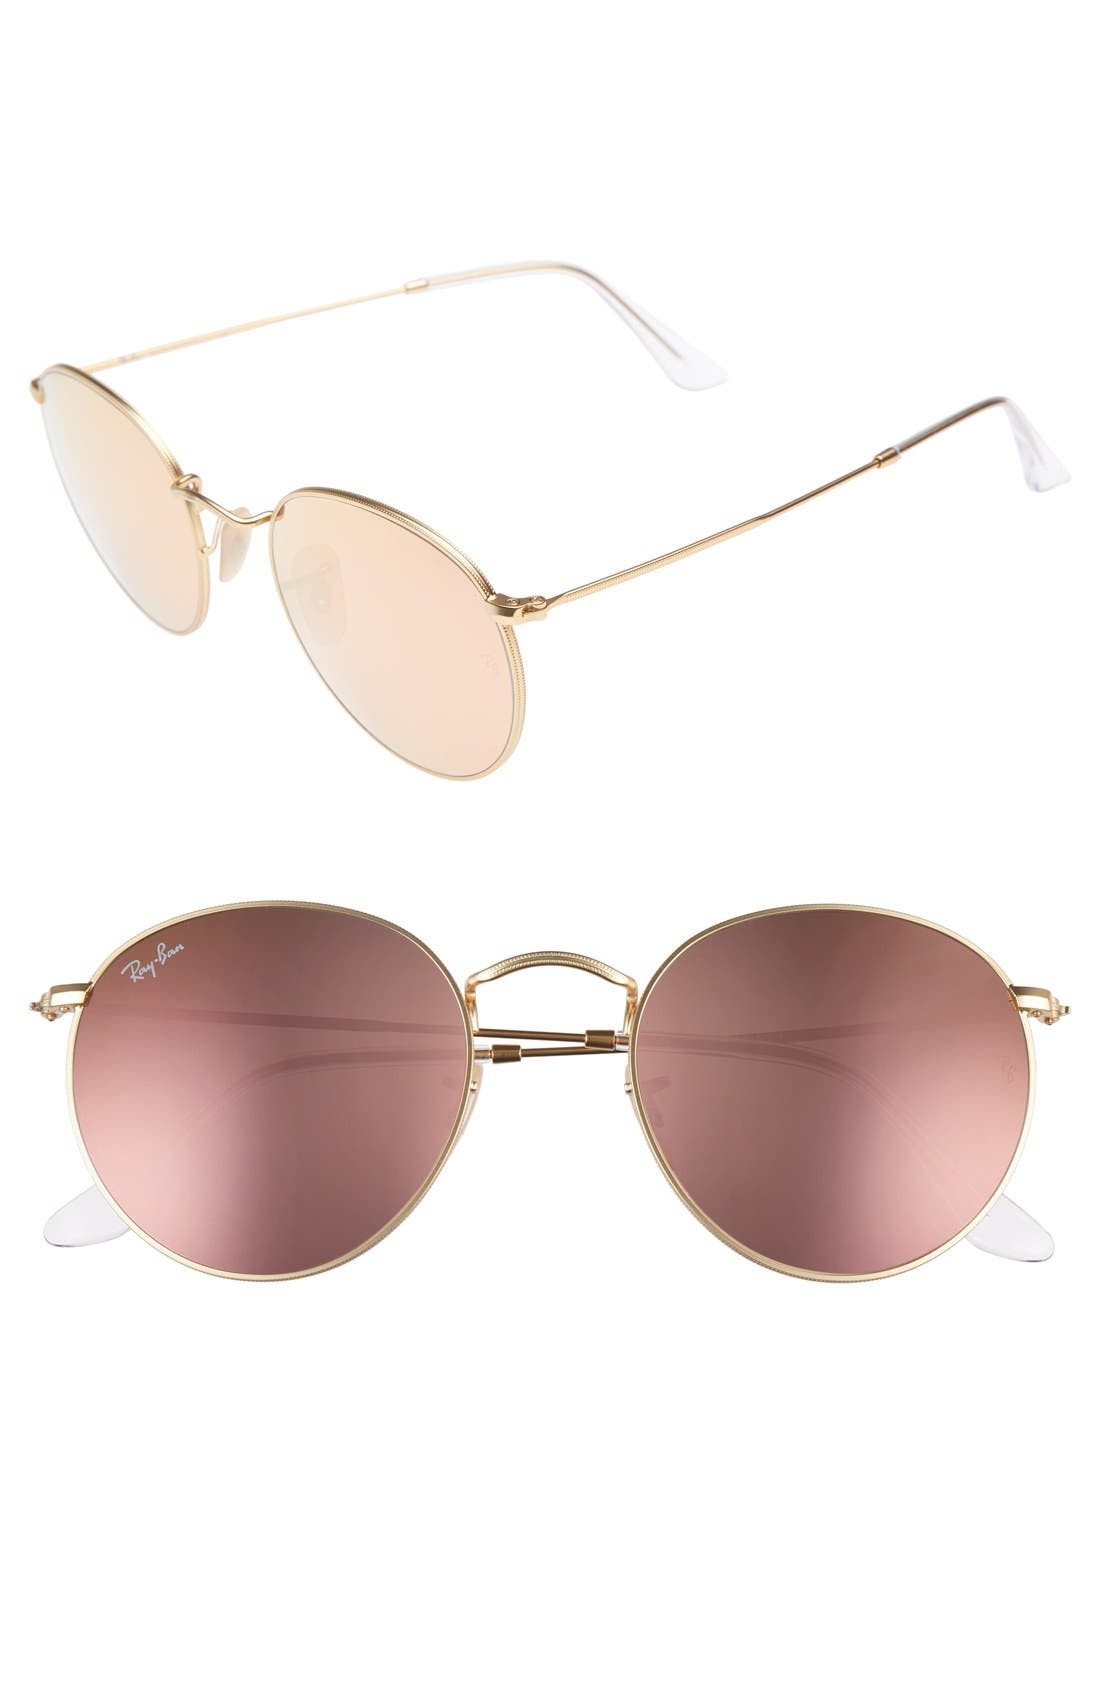 8422aa9c00a3c Ray ban icons retro sunglasses nordstrom jpg 480x730 Icon 53mm retro